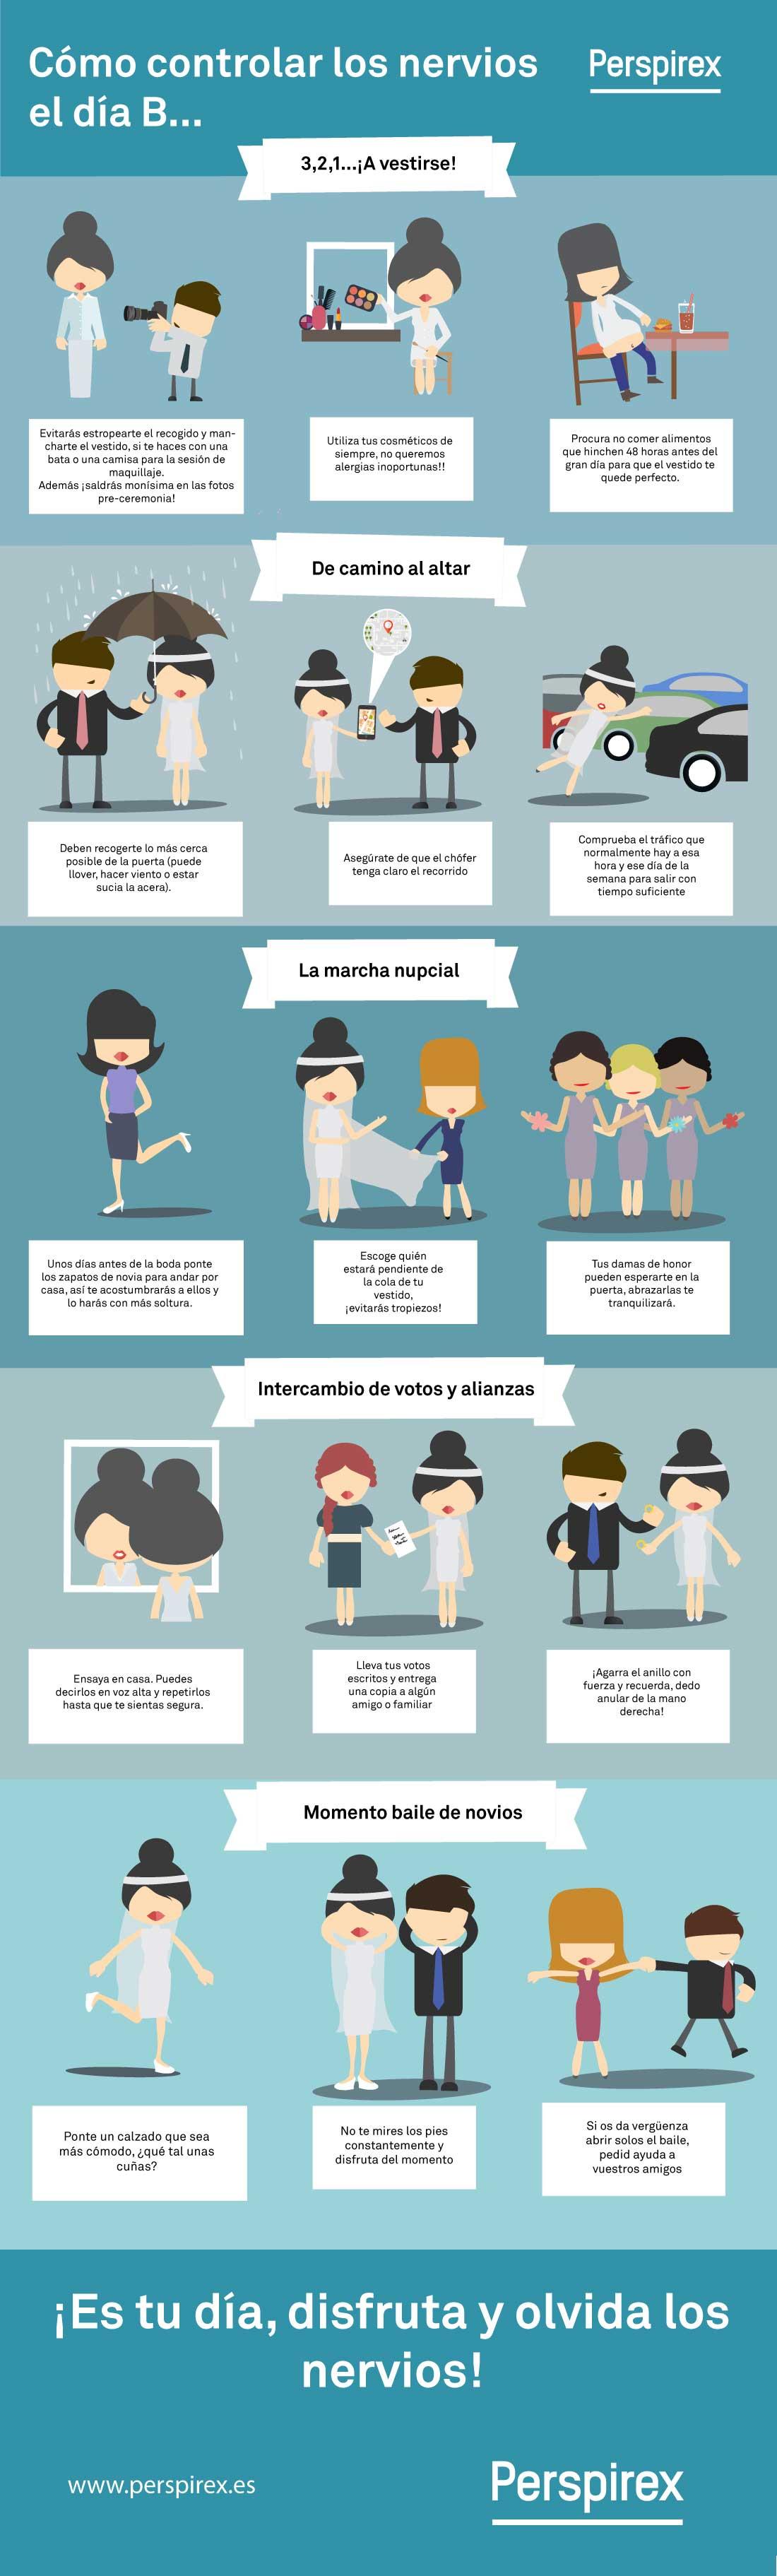 Consejos controlar nervios dia de la boda wedding mivestidoazul (2)